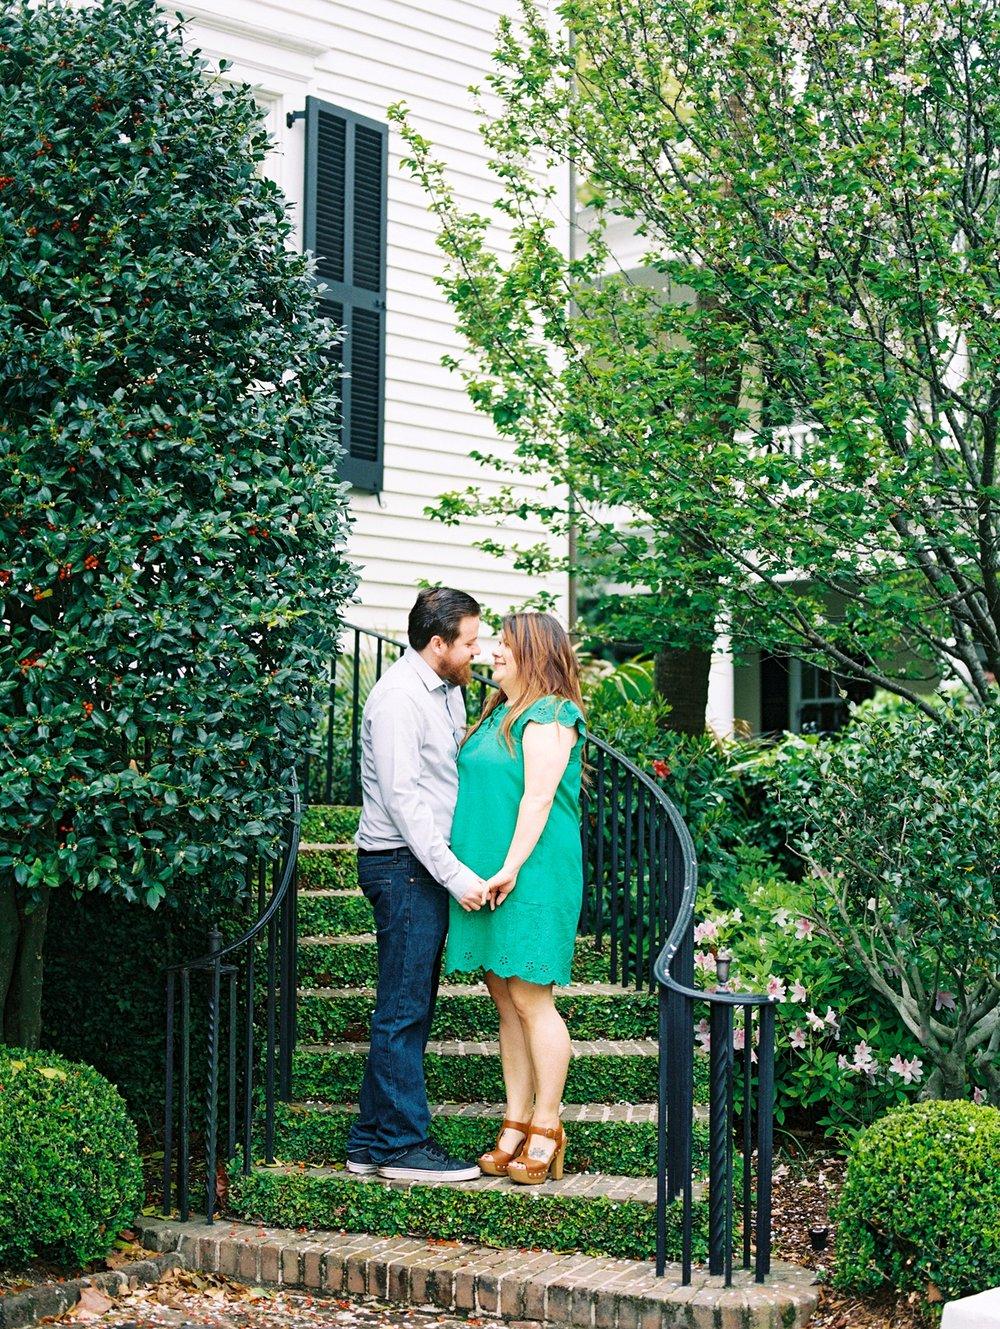 Lisa Silva Photography- Ponte Vedra Beach and Jacksonville, Florida Fine Art Film Wedding Photography- Engagement Session in Historic Charleston, South Carolina_0012.jpg